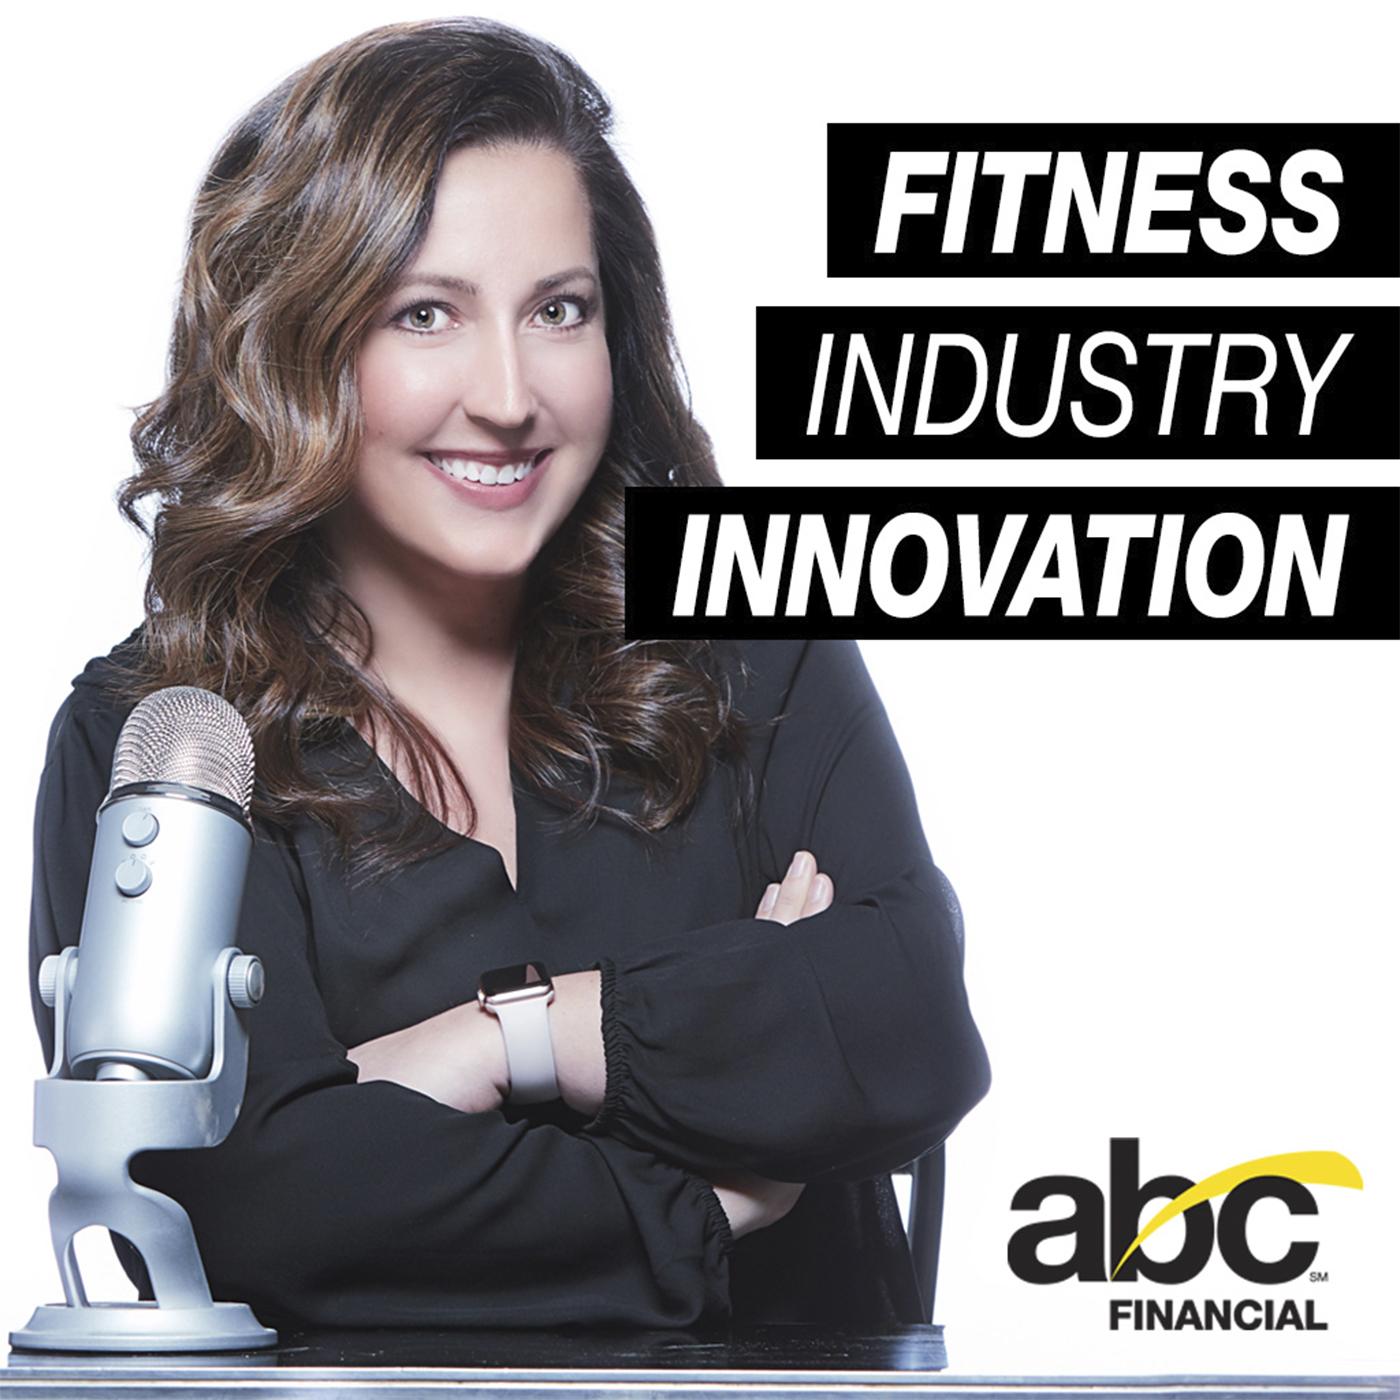 Fitness Industry Innovation Podcast